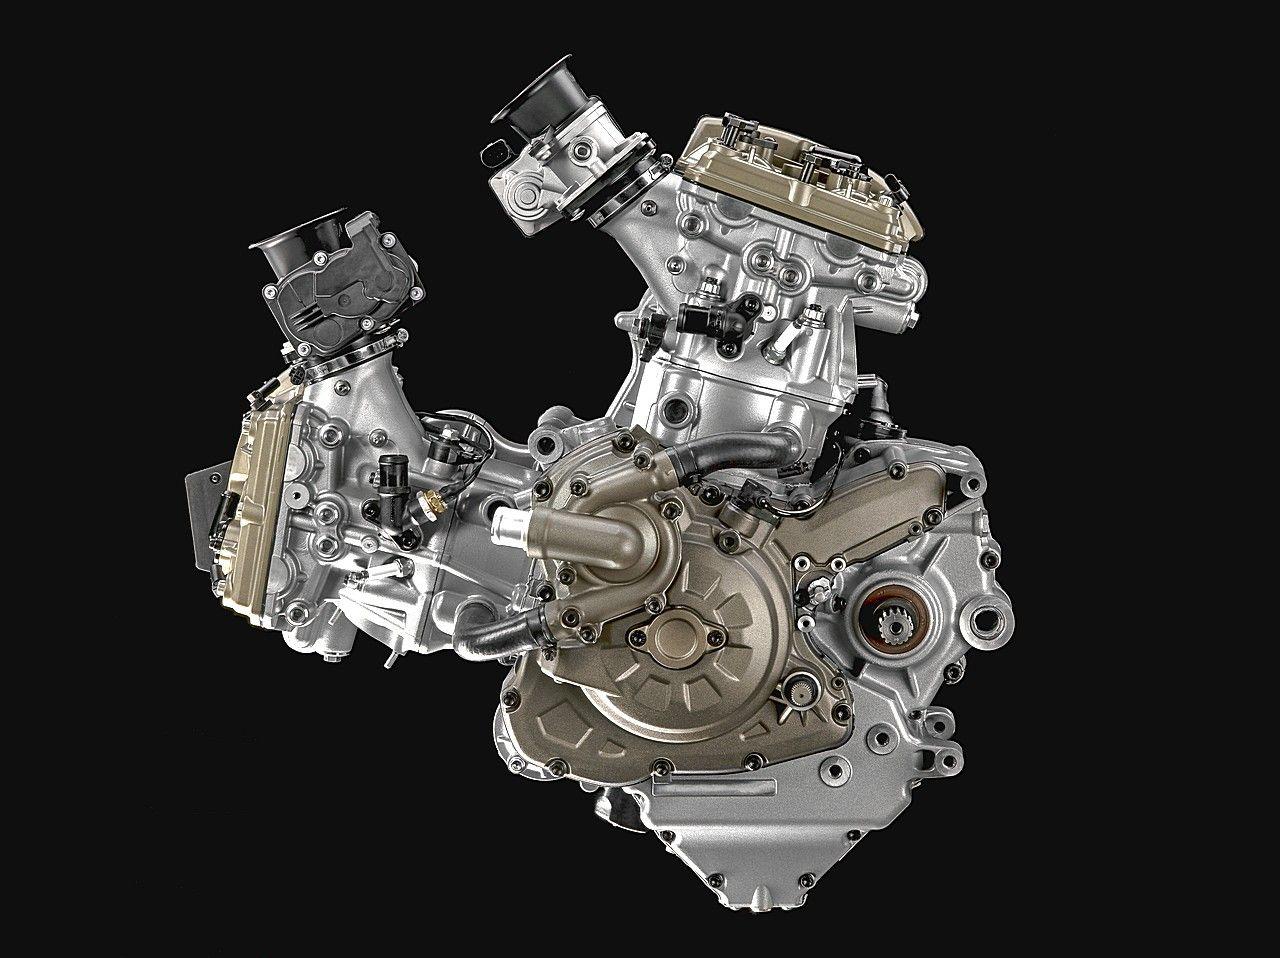 Ducati Multistrada 2015 test